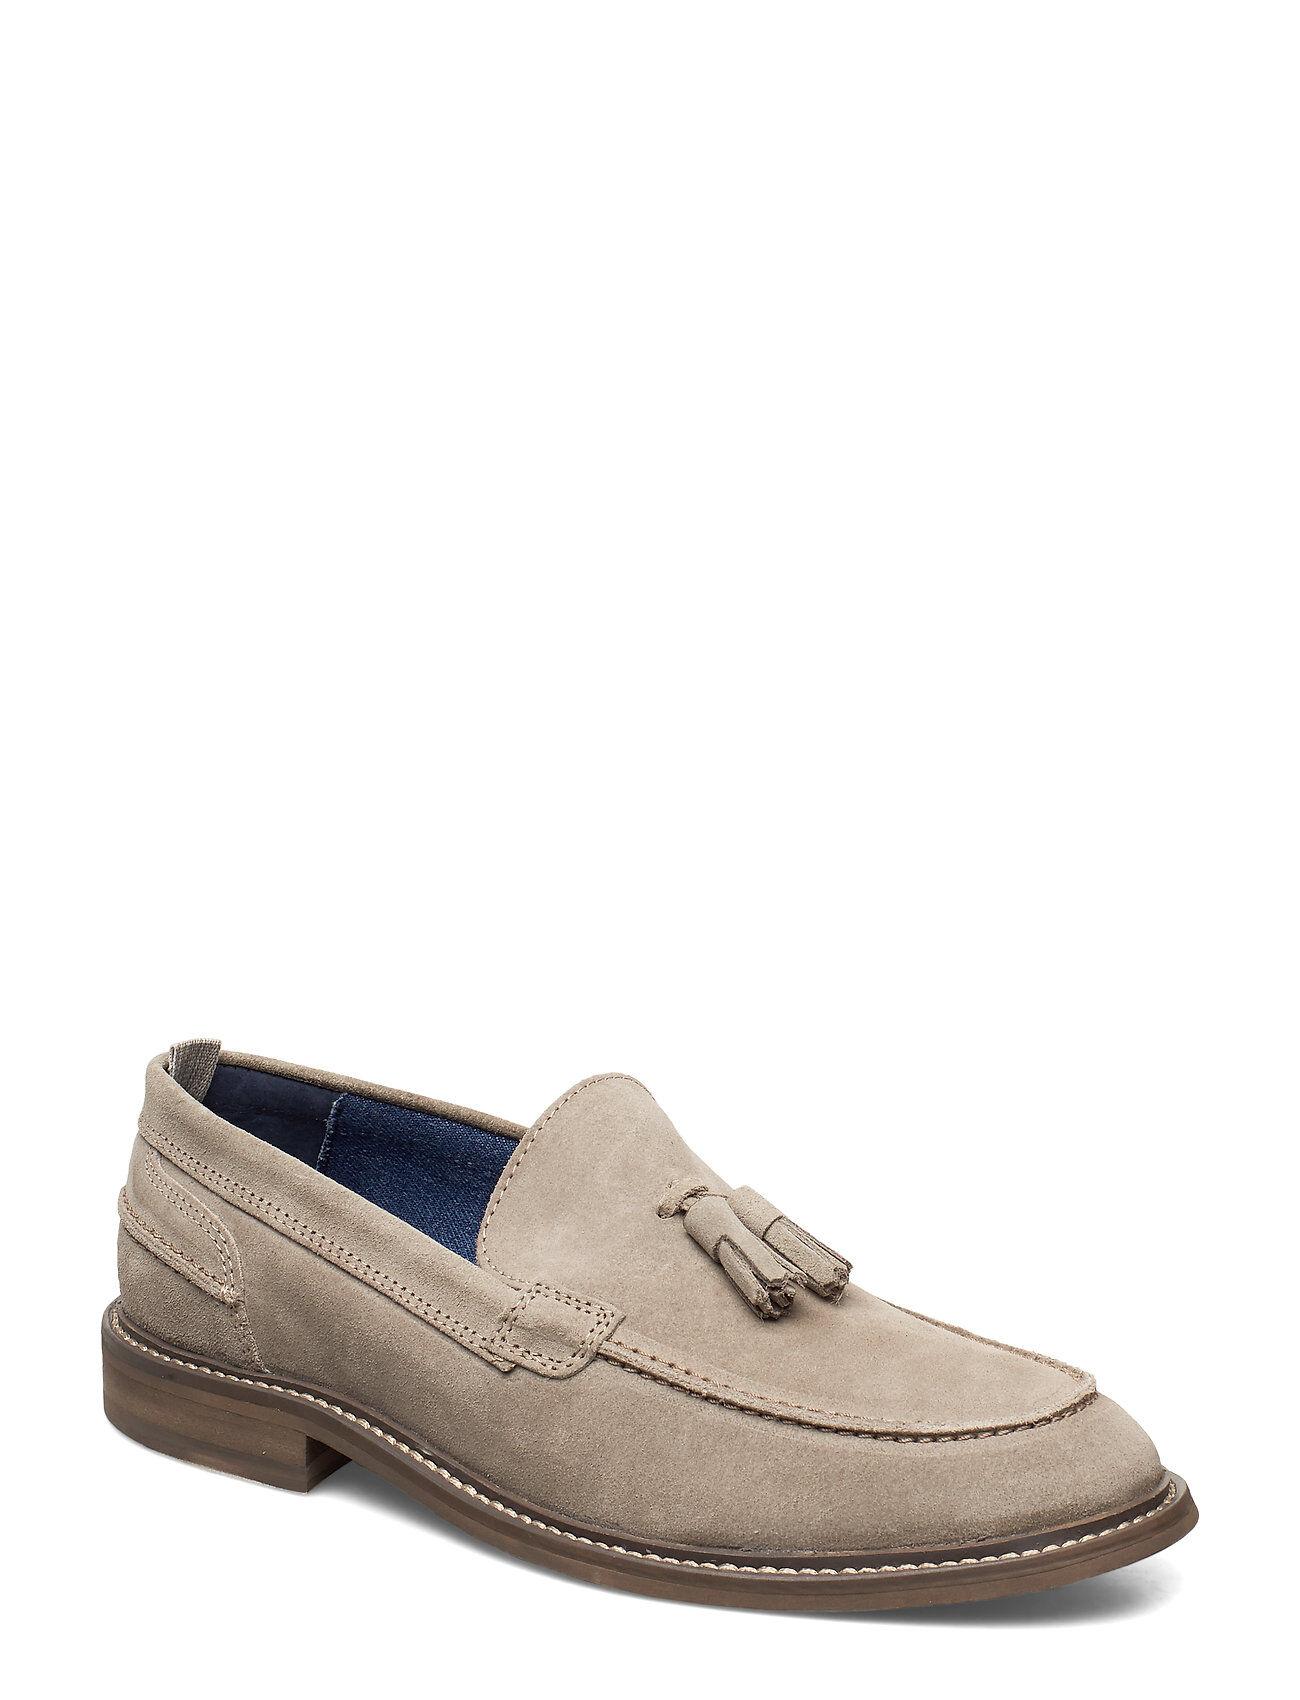 Playboy Footwear Oklahoma Loaferit Matalat Kengät Beige Playboy Footwear